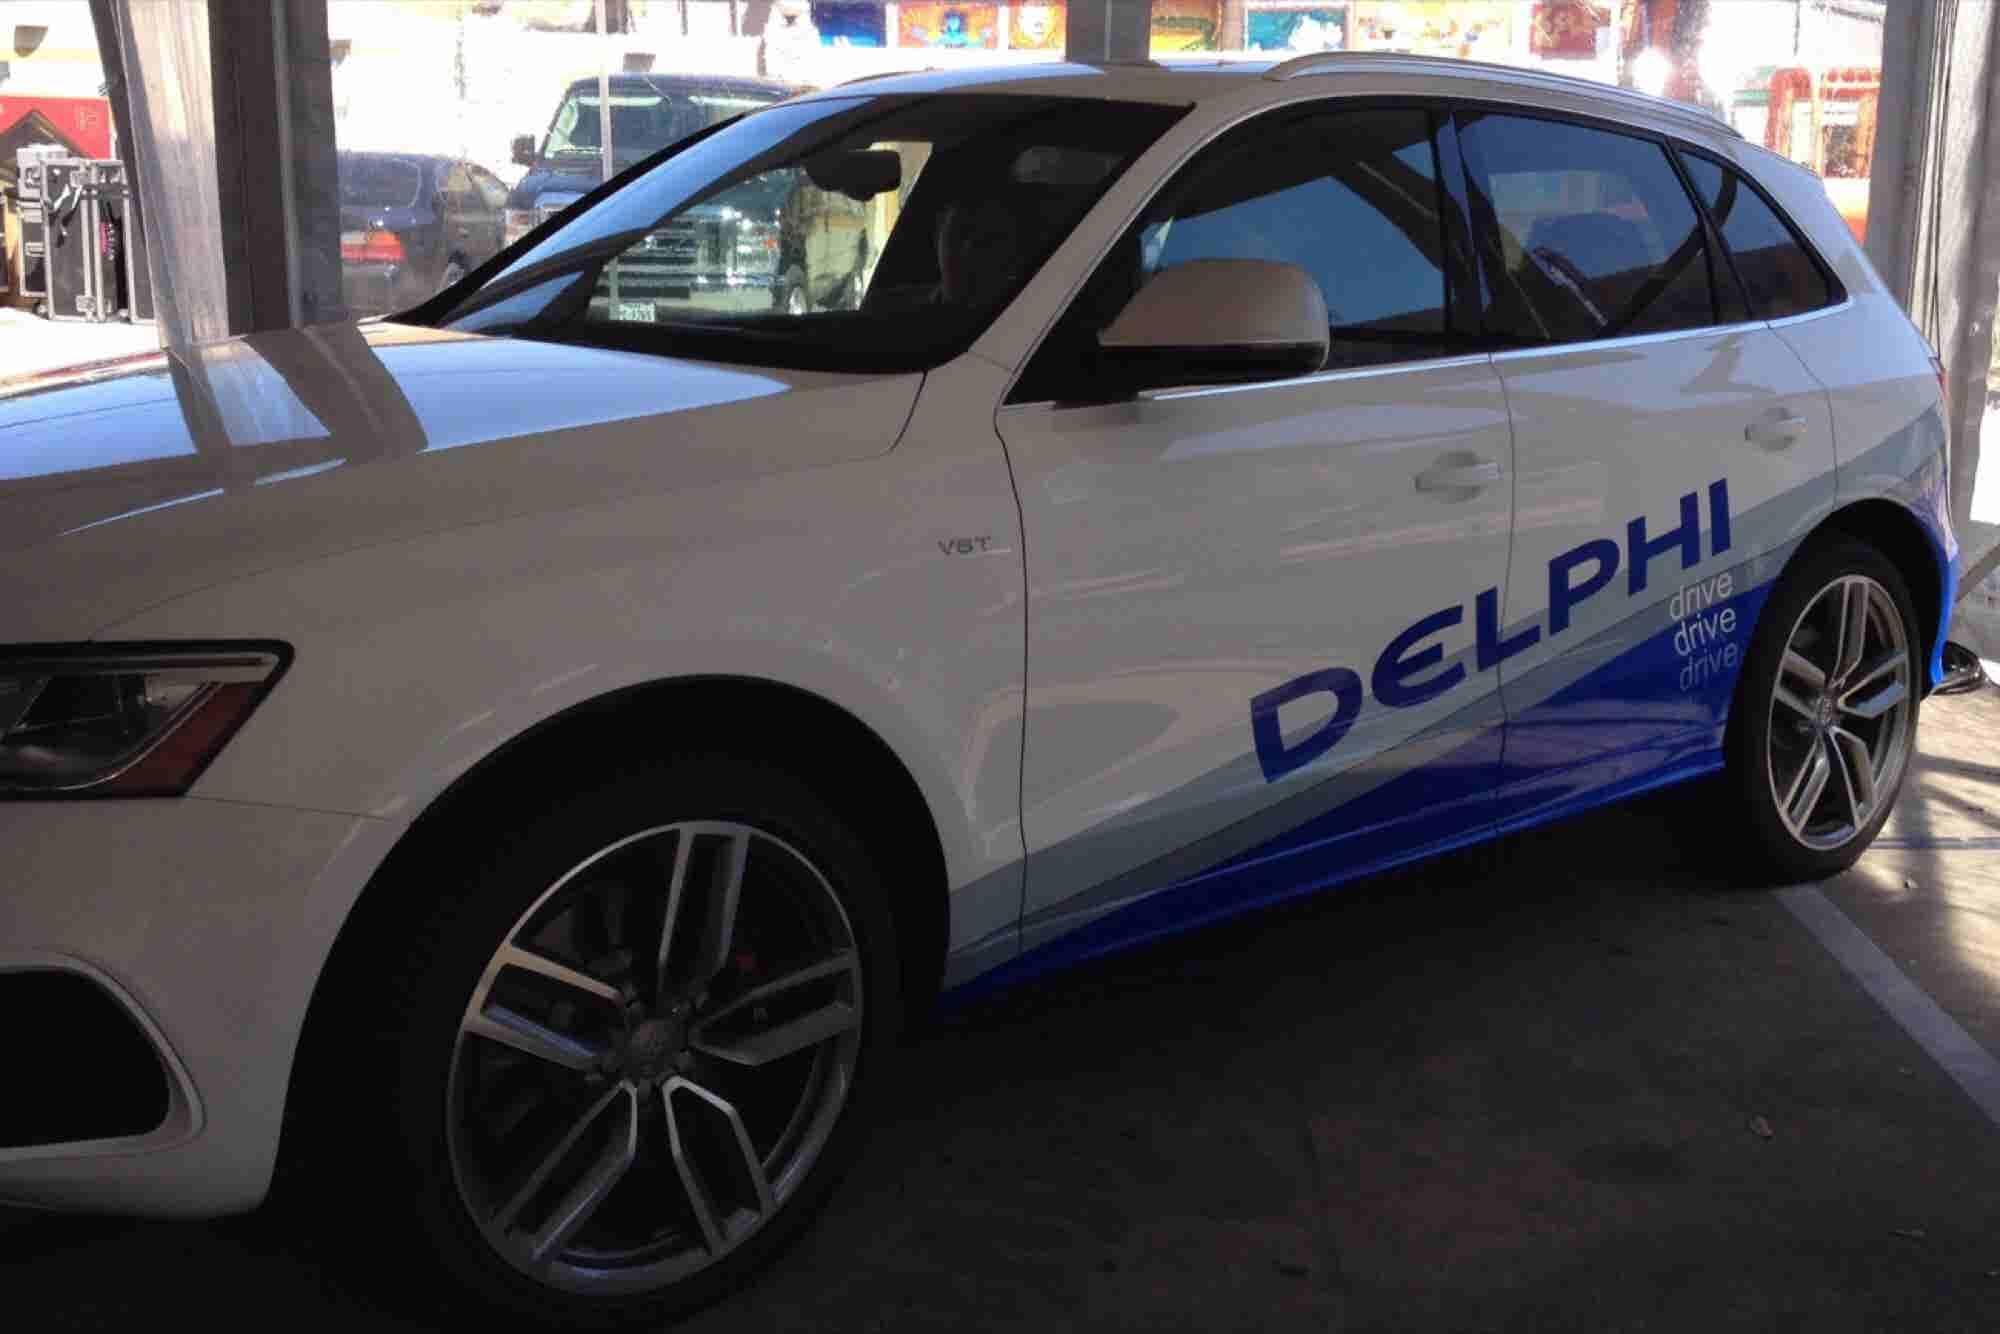 SXSW: Self-Driving Audi to Make First Coast-to-Coast U.S. Drive